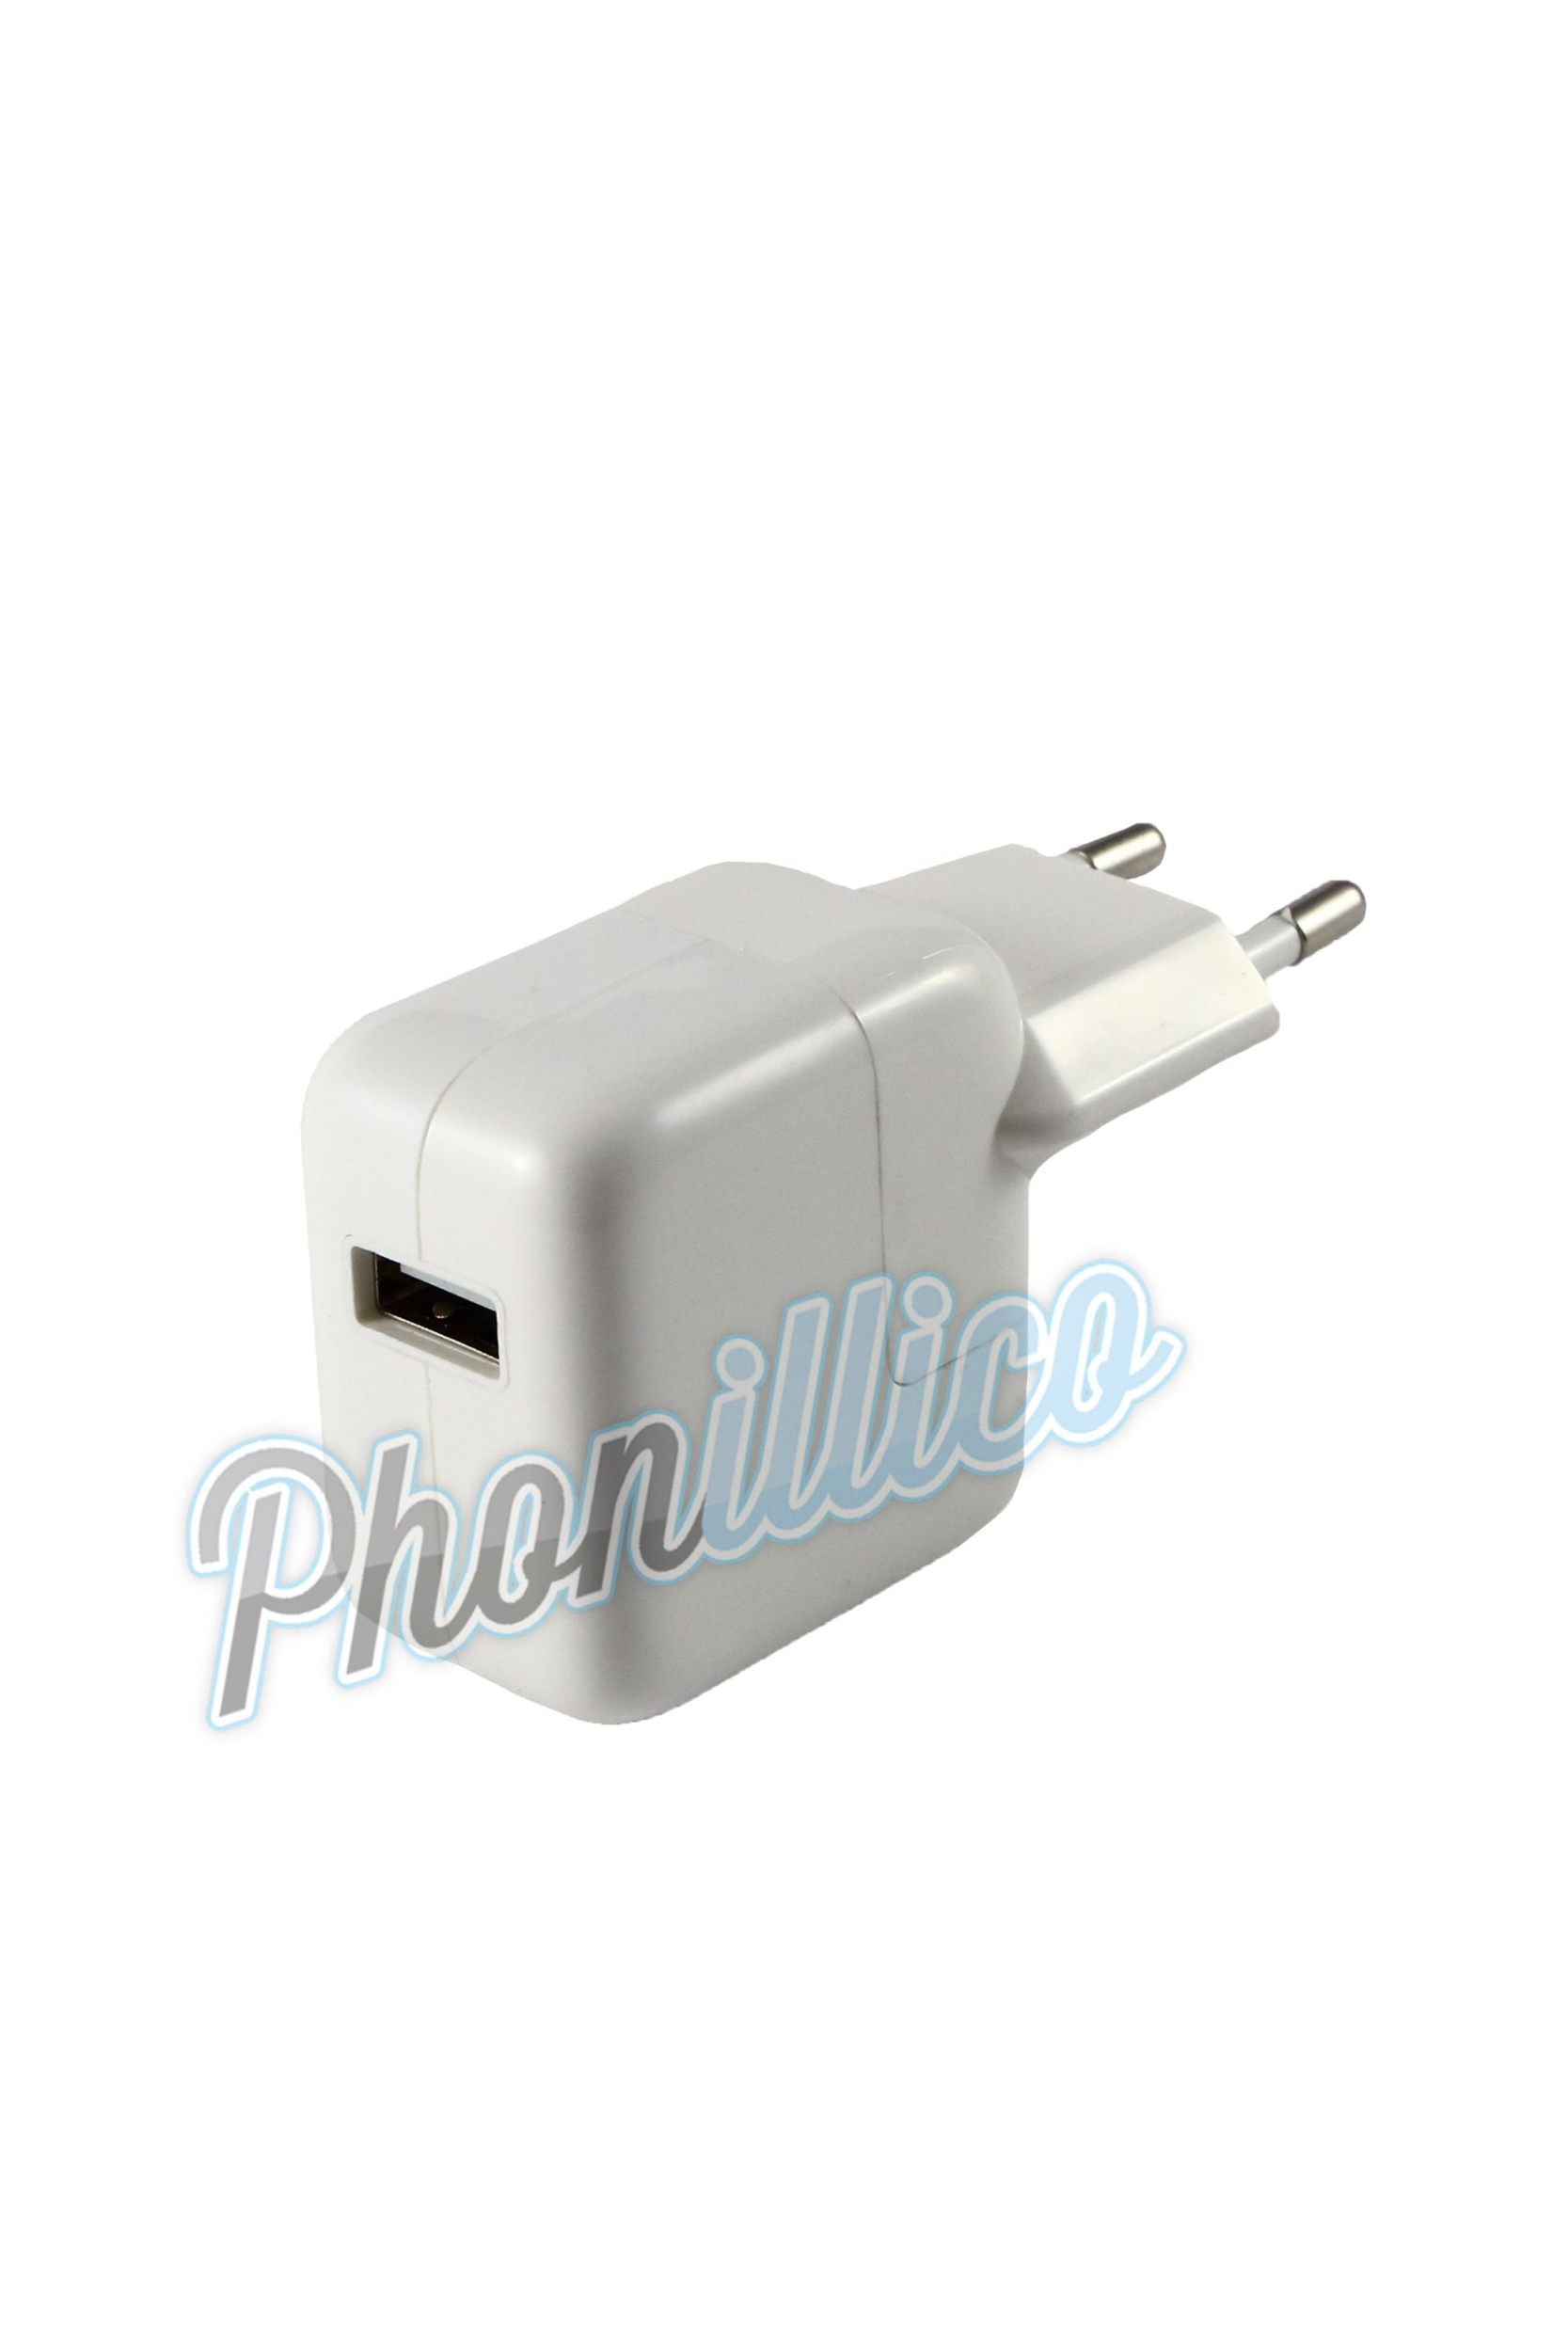 chargeur secteur pour apple ipad 2 3 4 apple ipad 2 3 4 phonillico. Black Bedroom Furniture Sets. Home Design Ideas